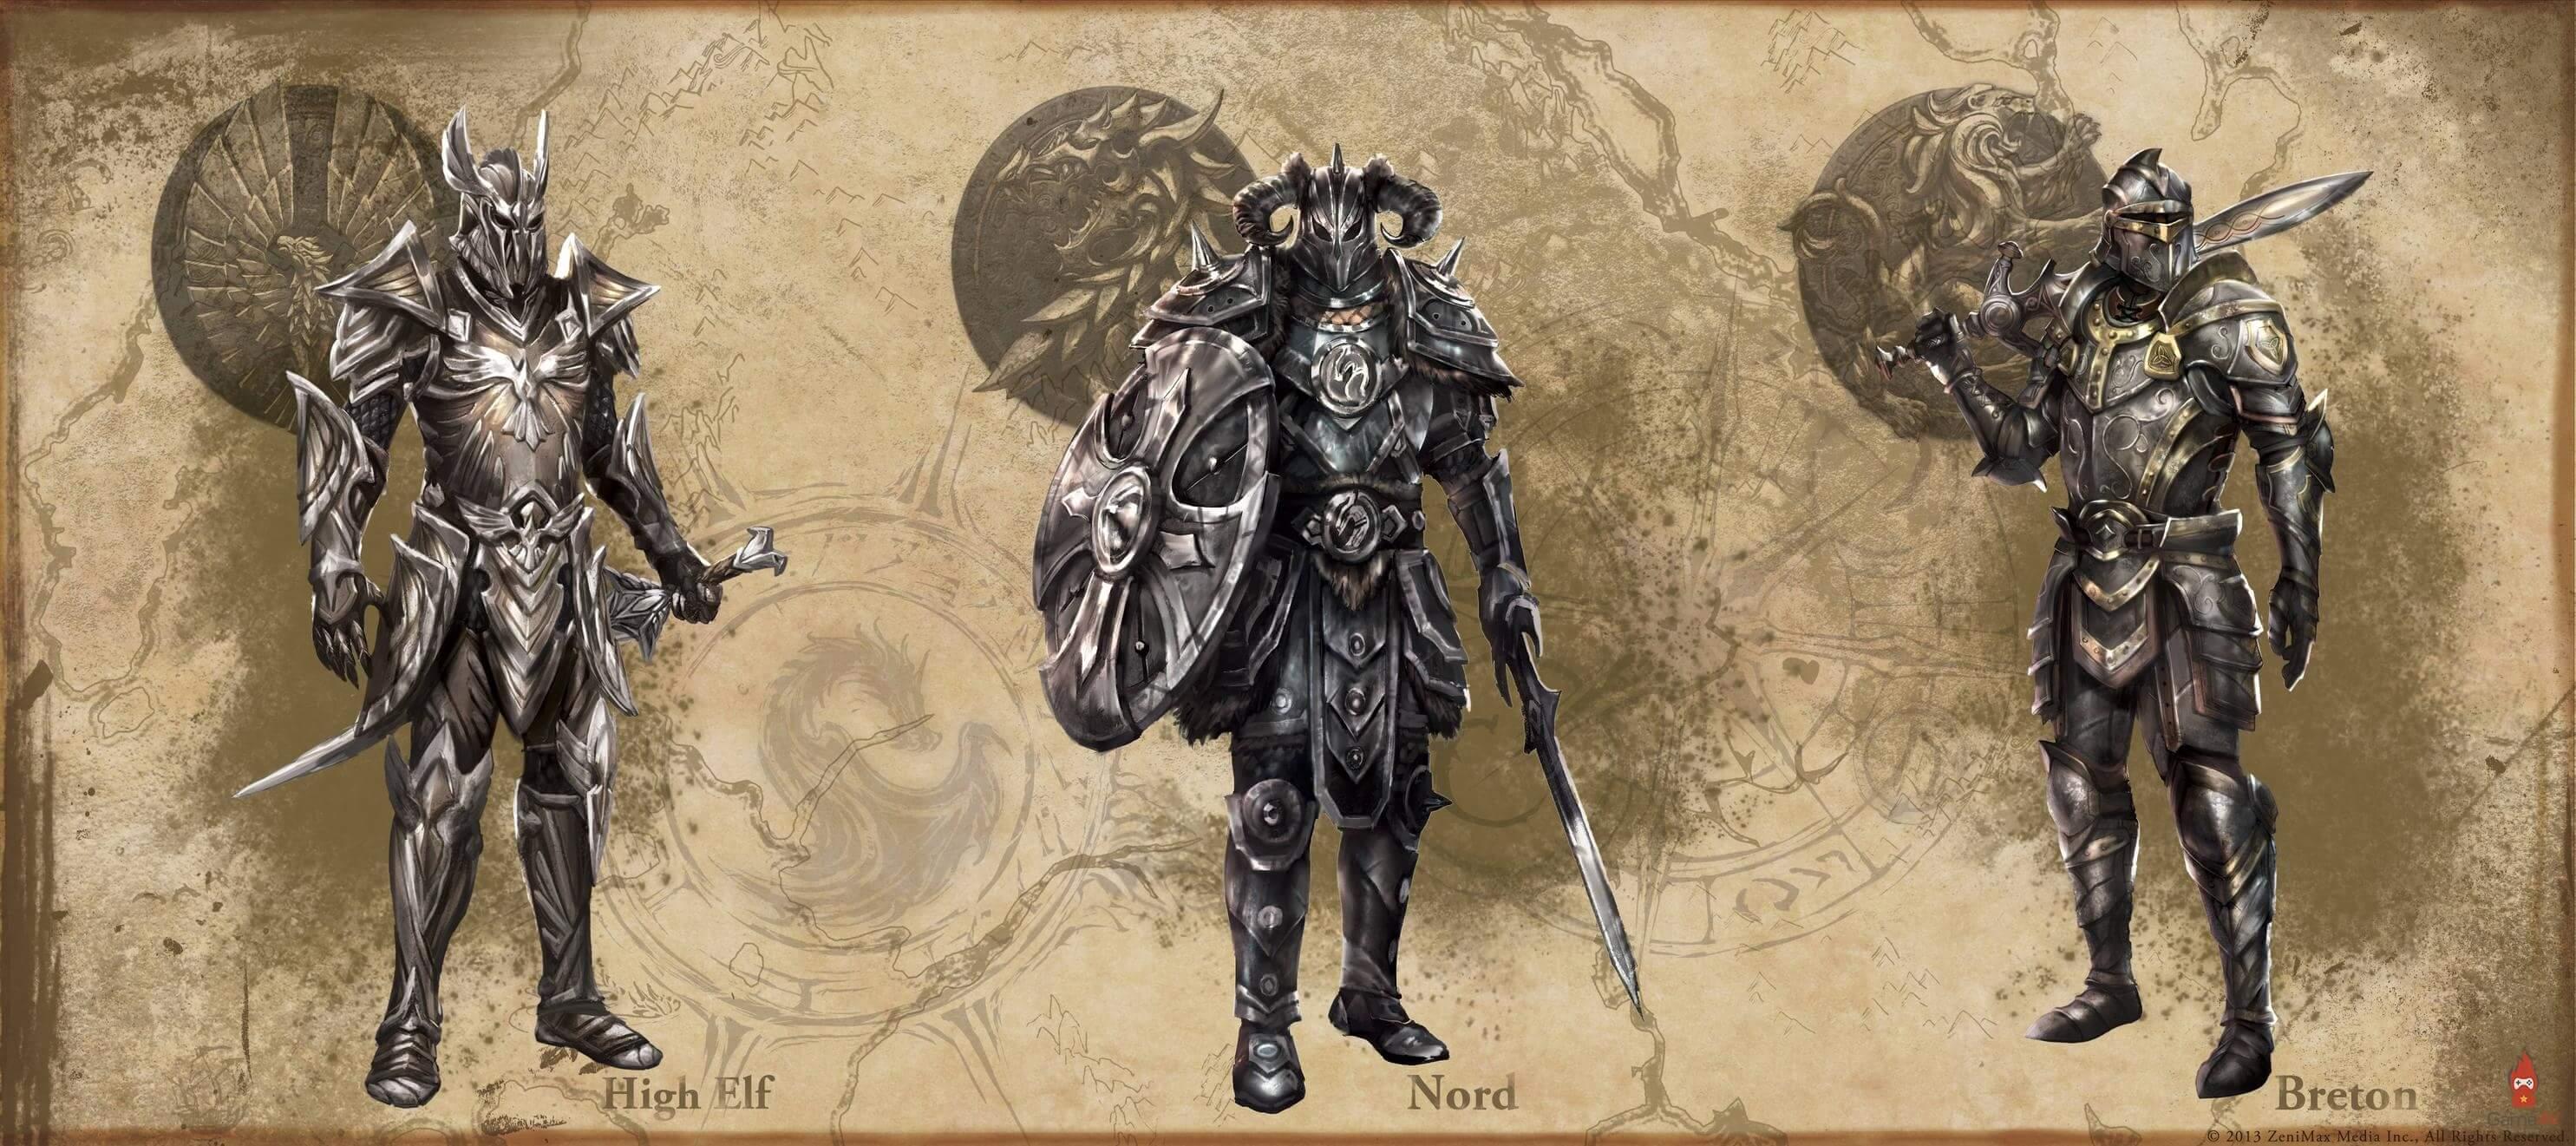 The Elder Scrolls Online 7 - Рыцарь дракон классовый гайдcd